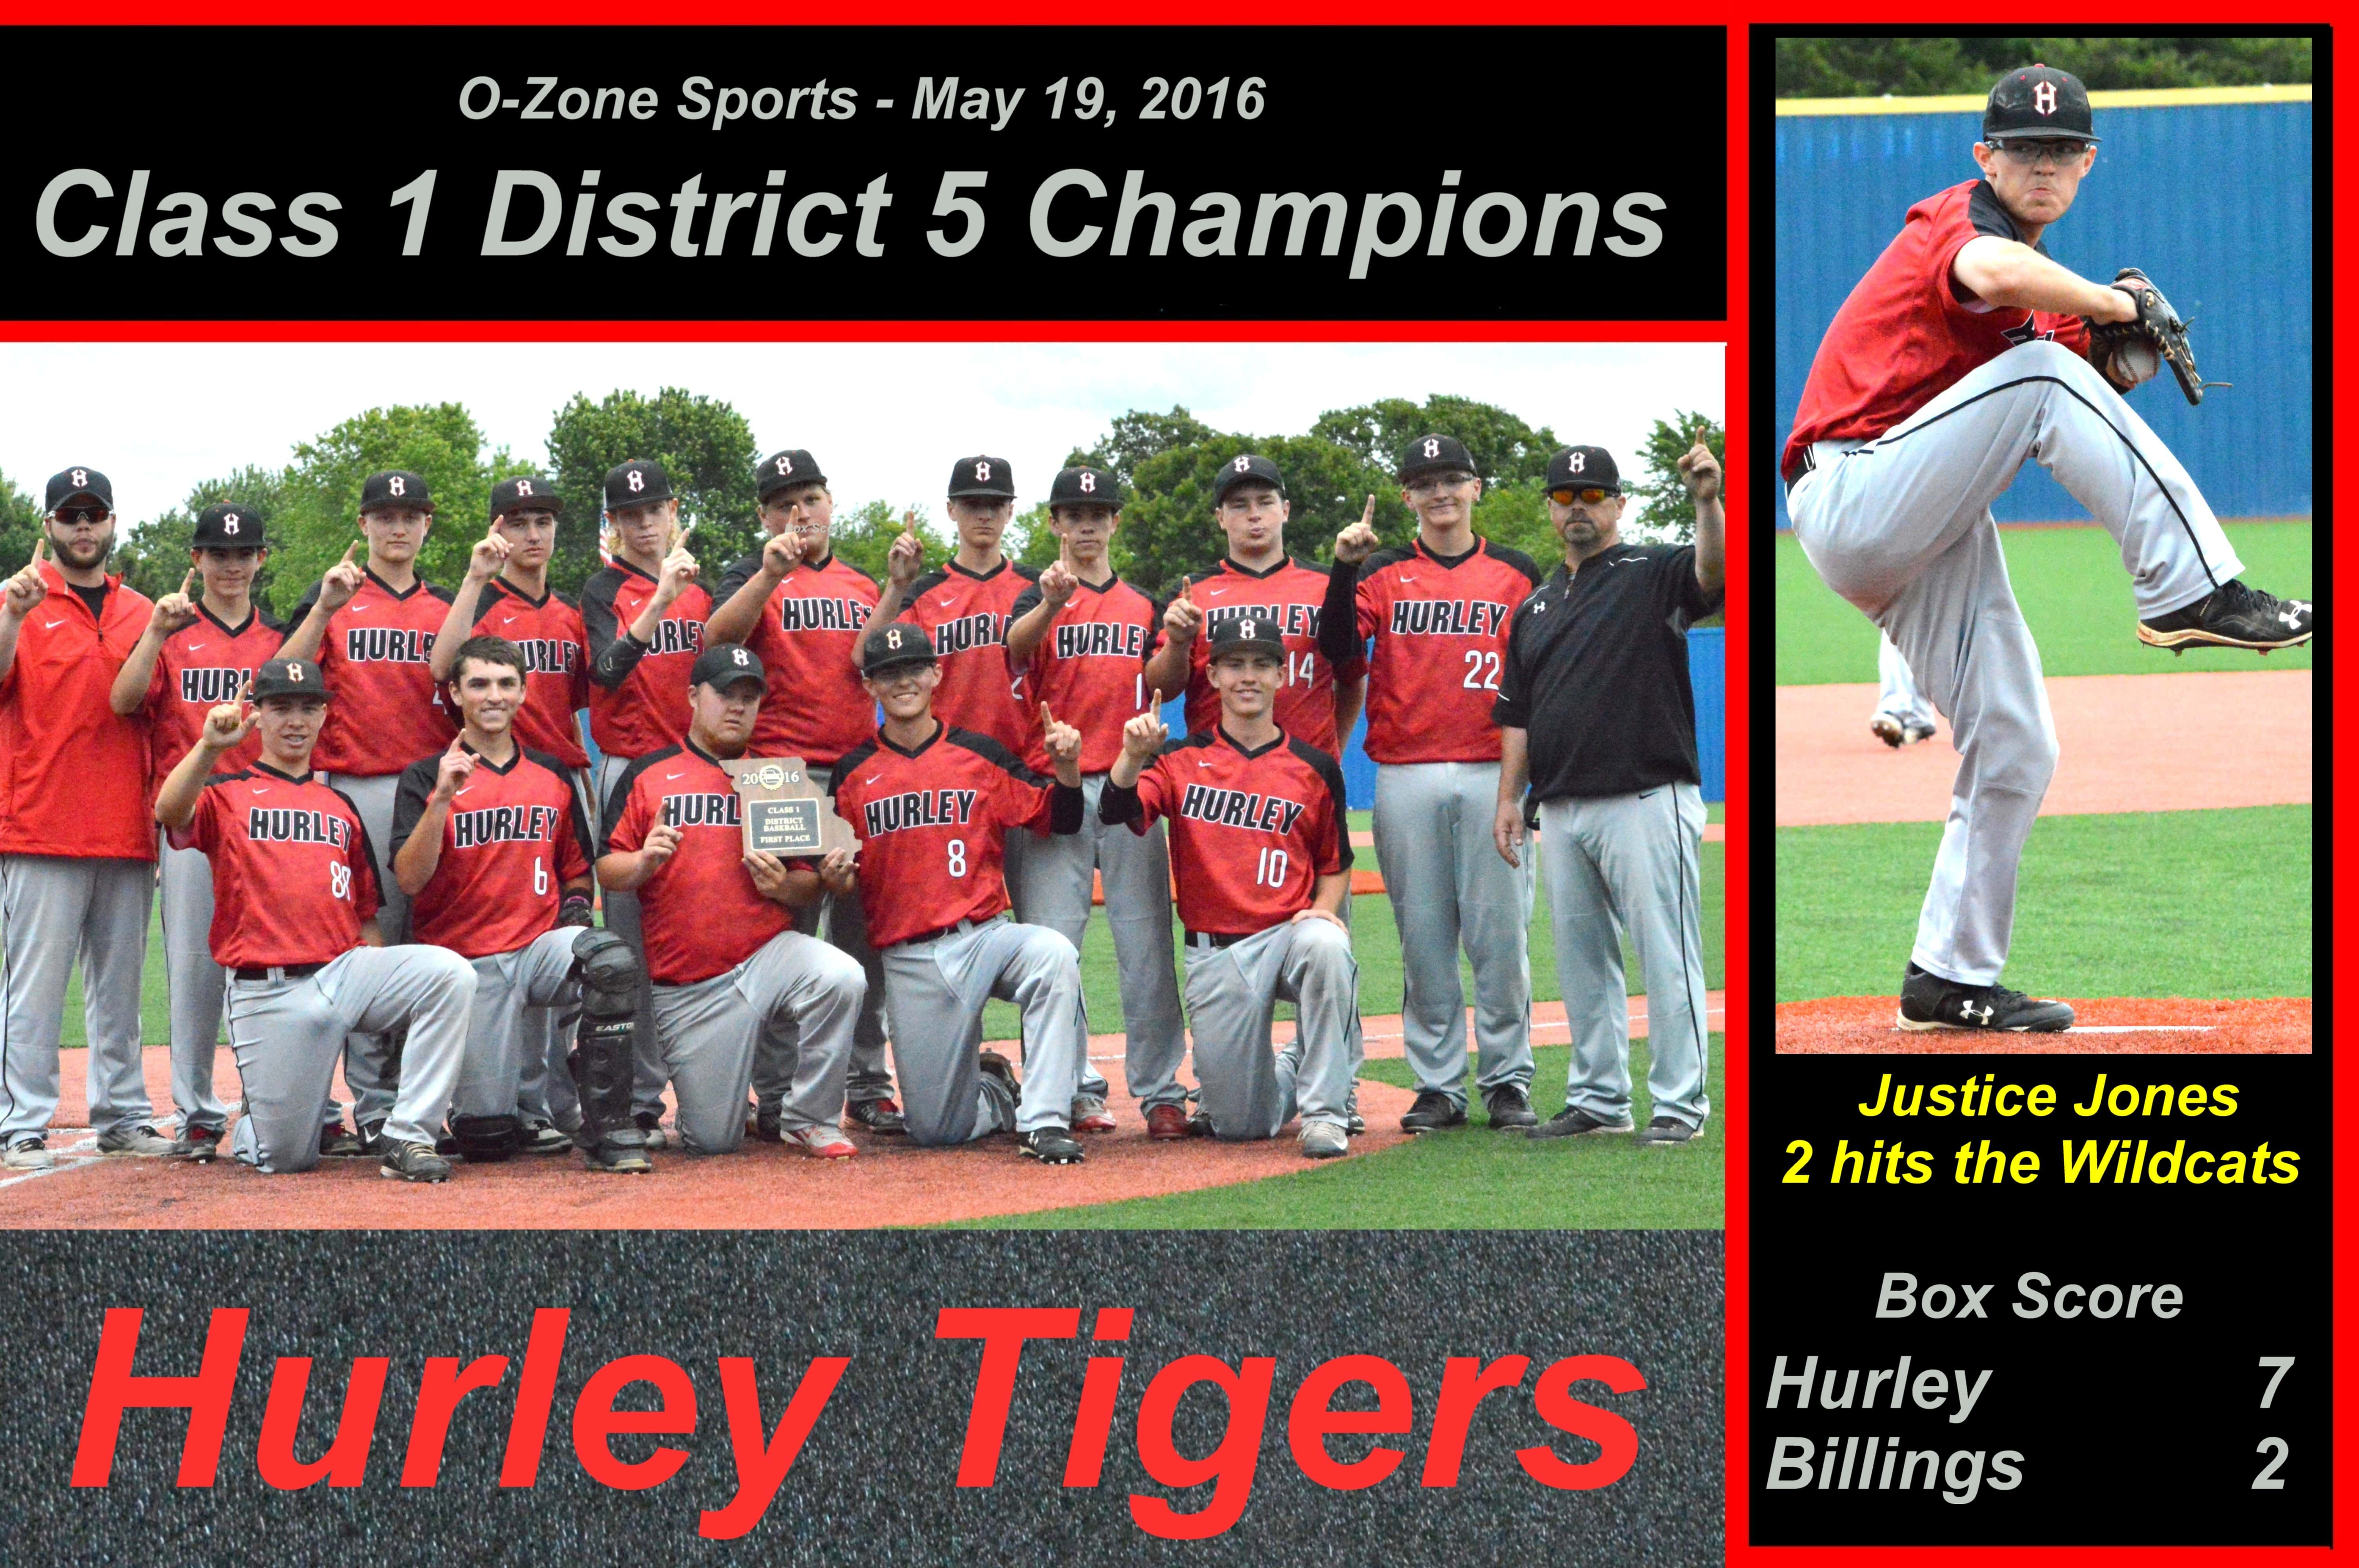 Hurley C1D5 Champions